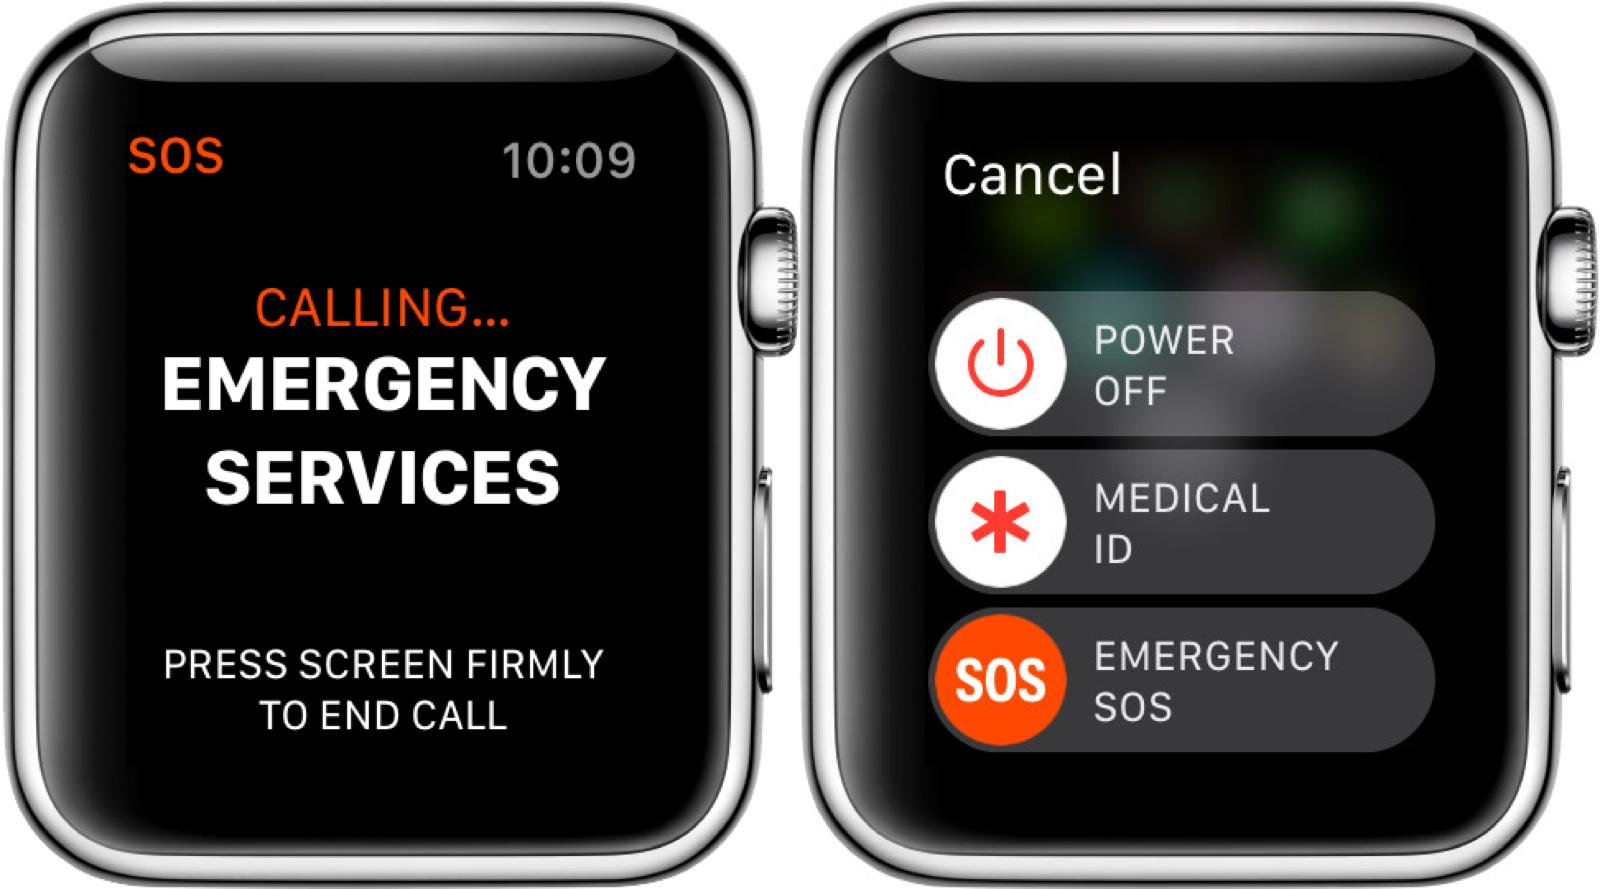 Apple Watch Emergency SOS Helps Student In Car Crash - The Mac Observer